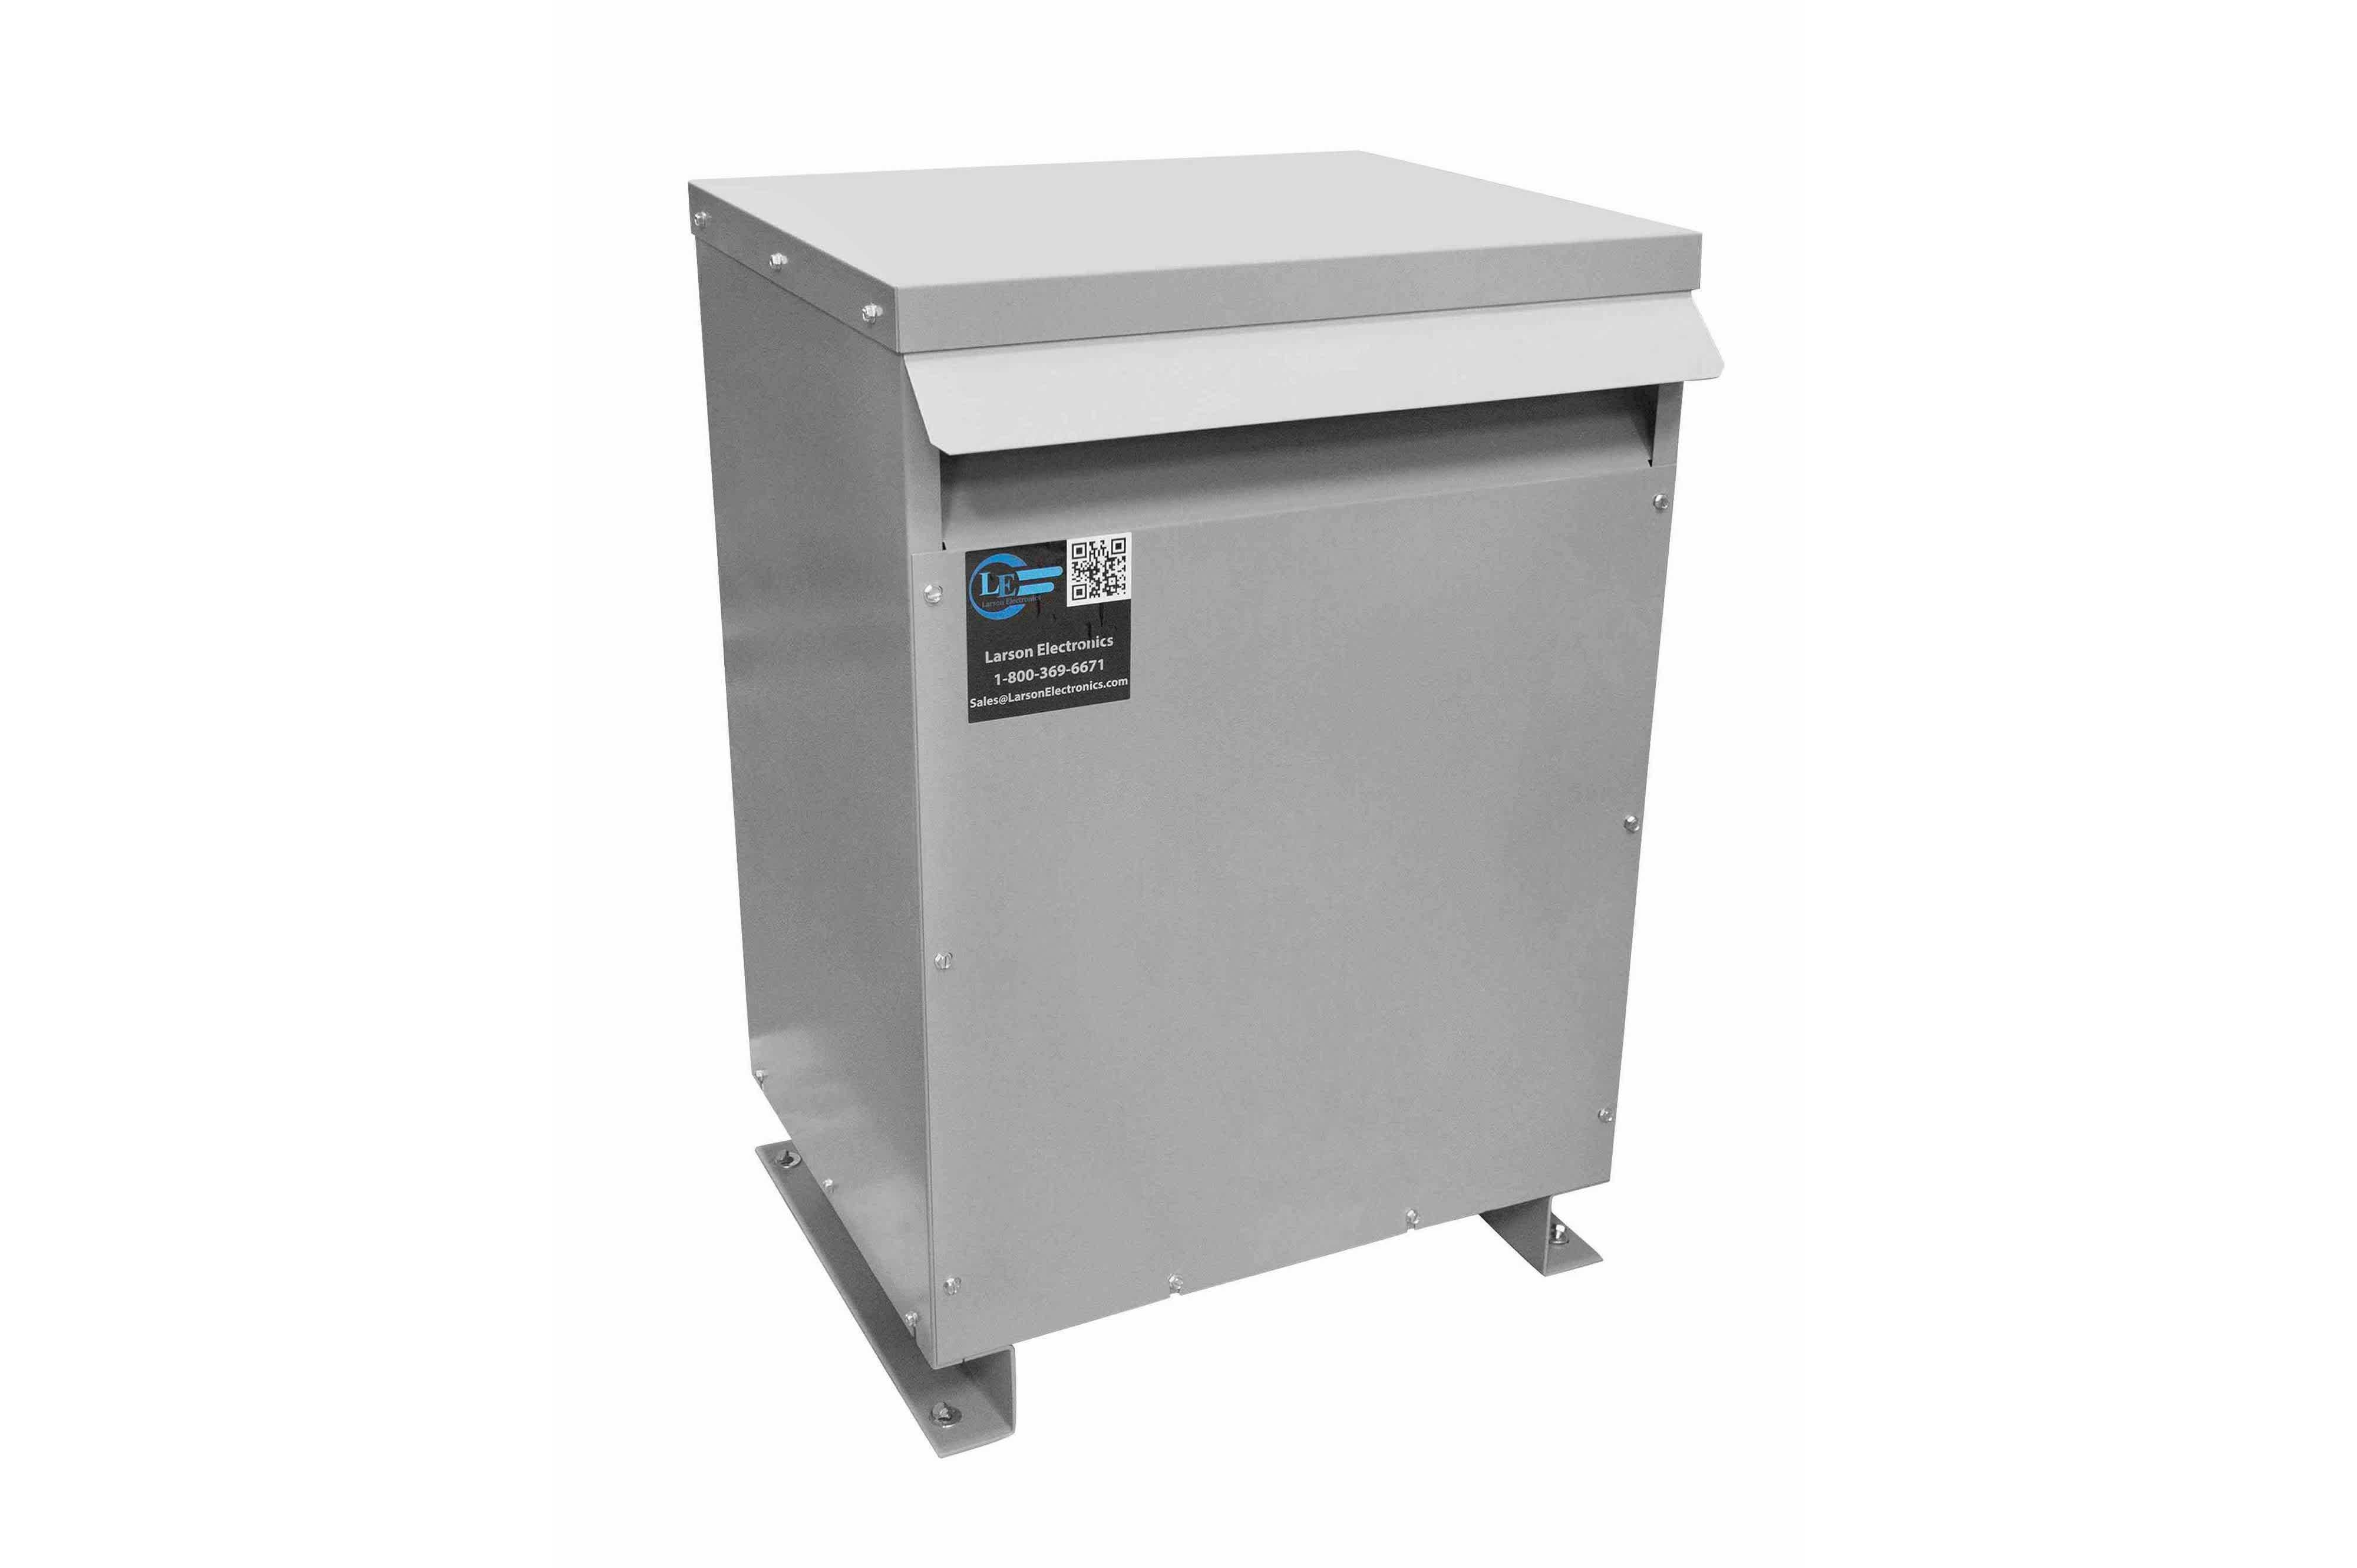 237.5 kVA 3PH Isolation Transformer, 480V Wye Primary, 380Y/220 Wye-N Secondary, N3R, Ventilated, 60 Hz